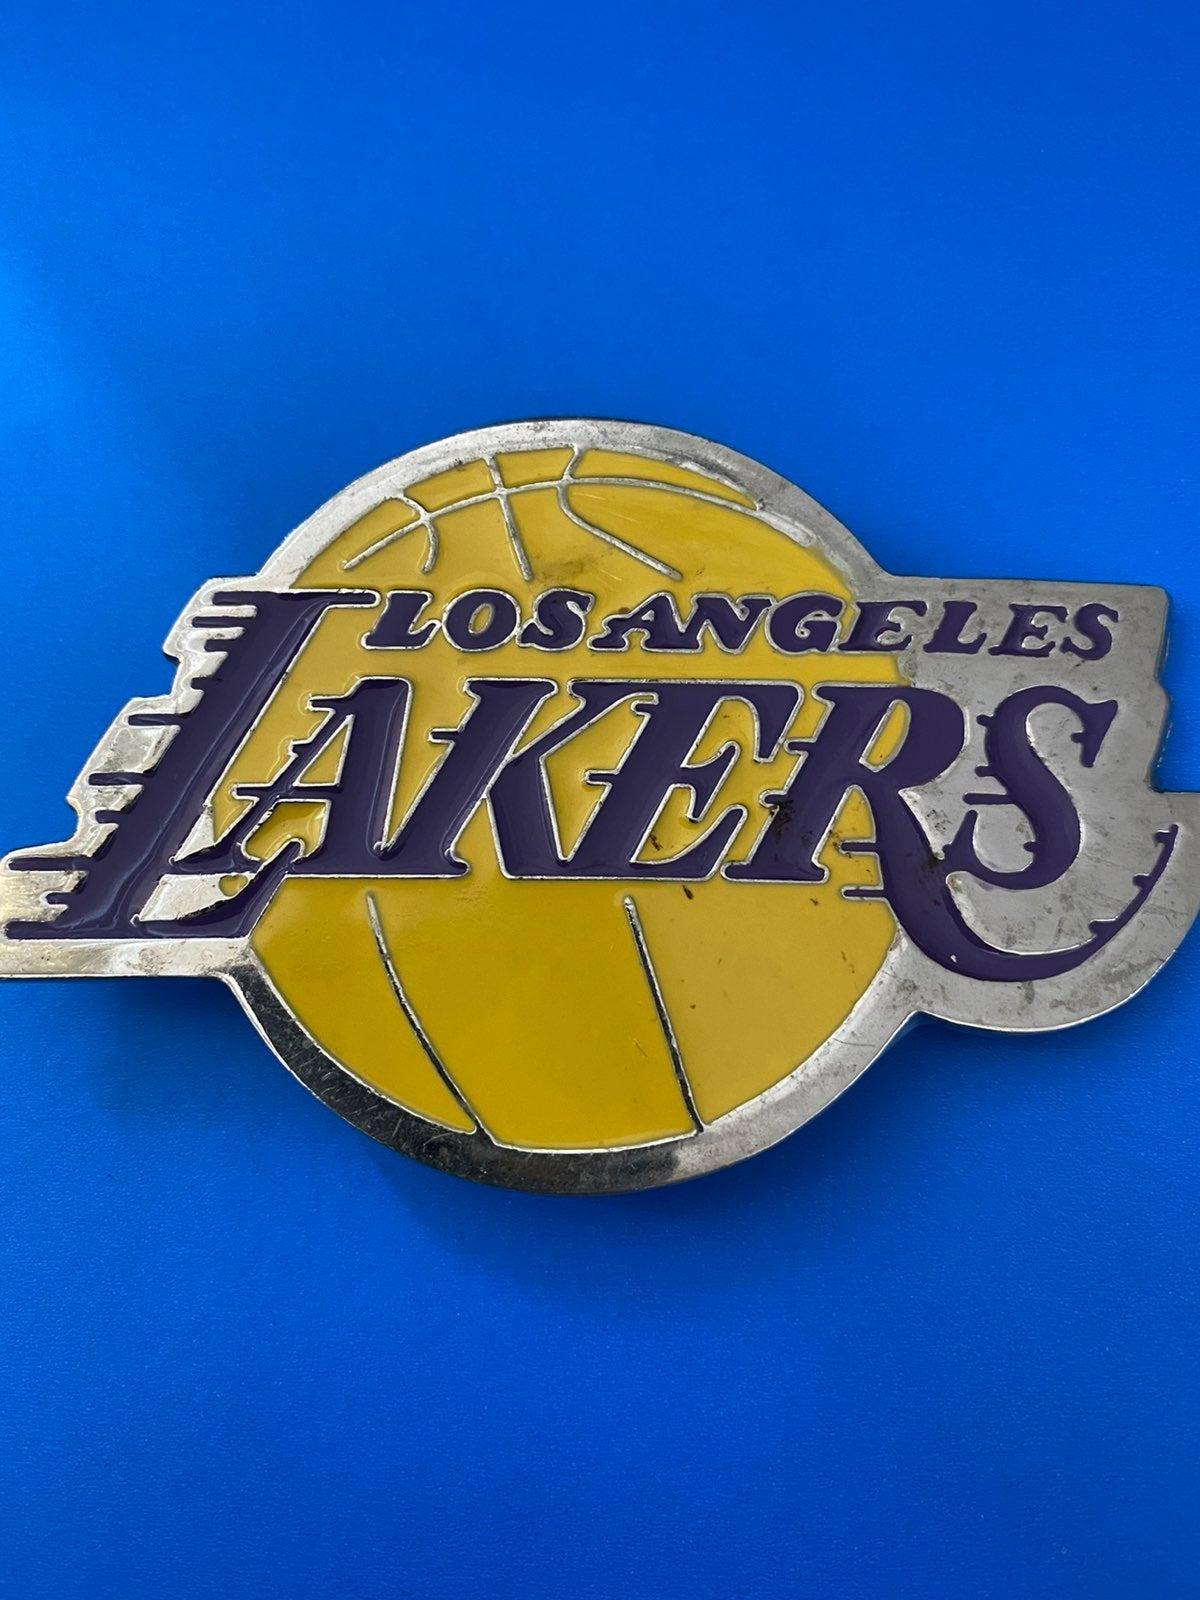 Lakers belt buckle